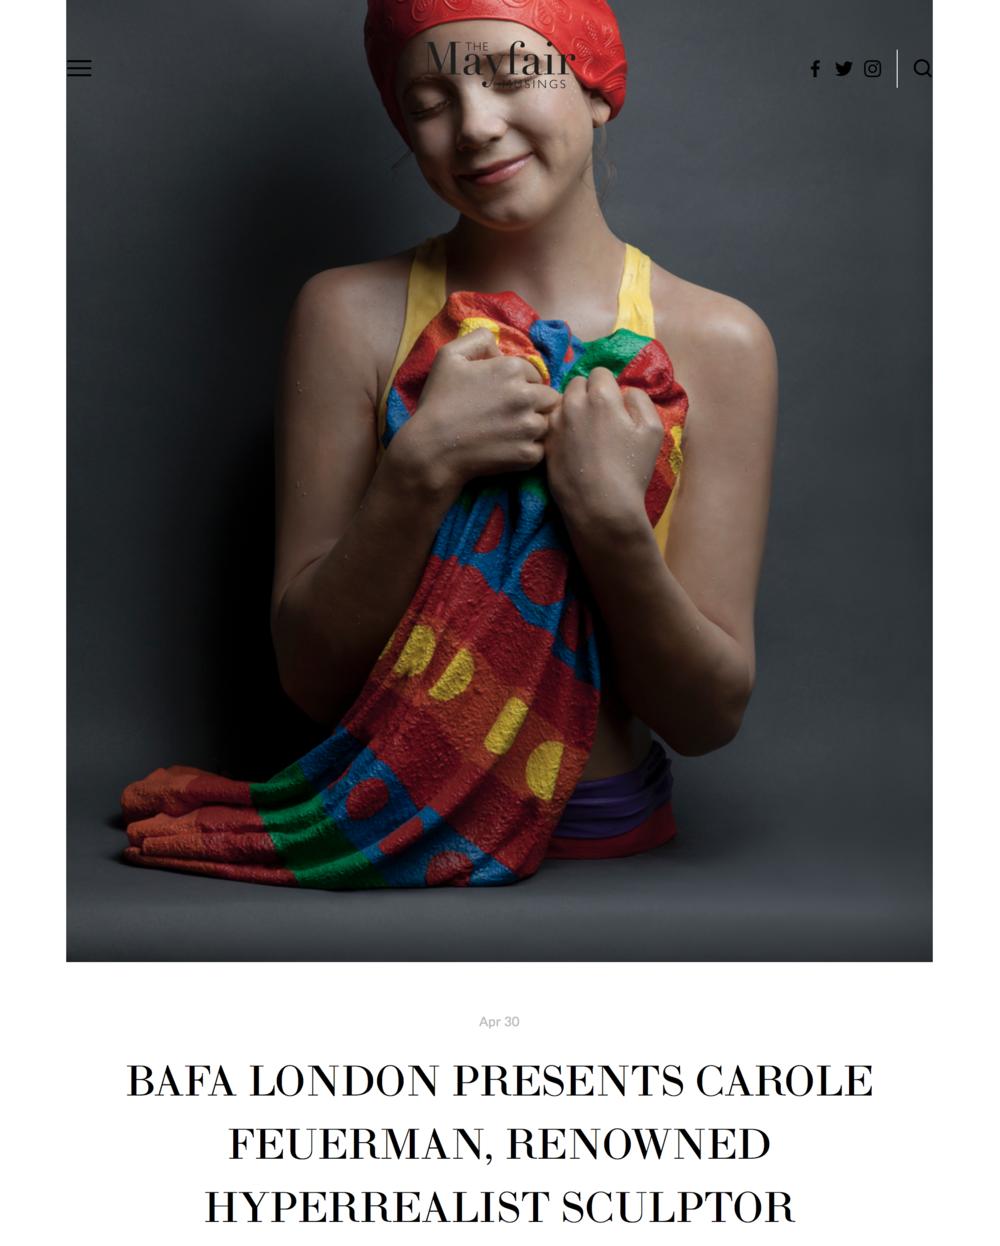 BAFA London Presents Carole Feuerman, Renowned Hyperrealist Sculptor